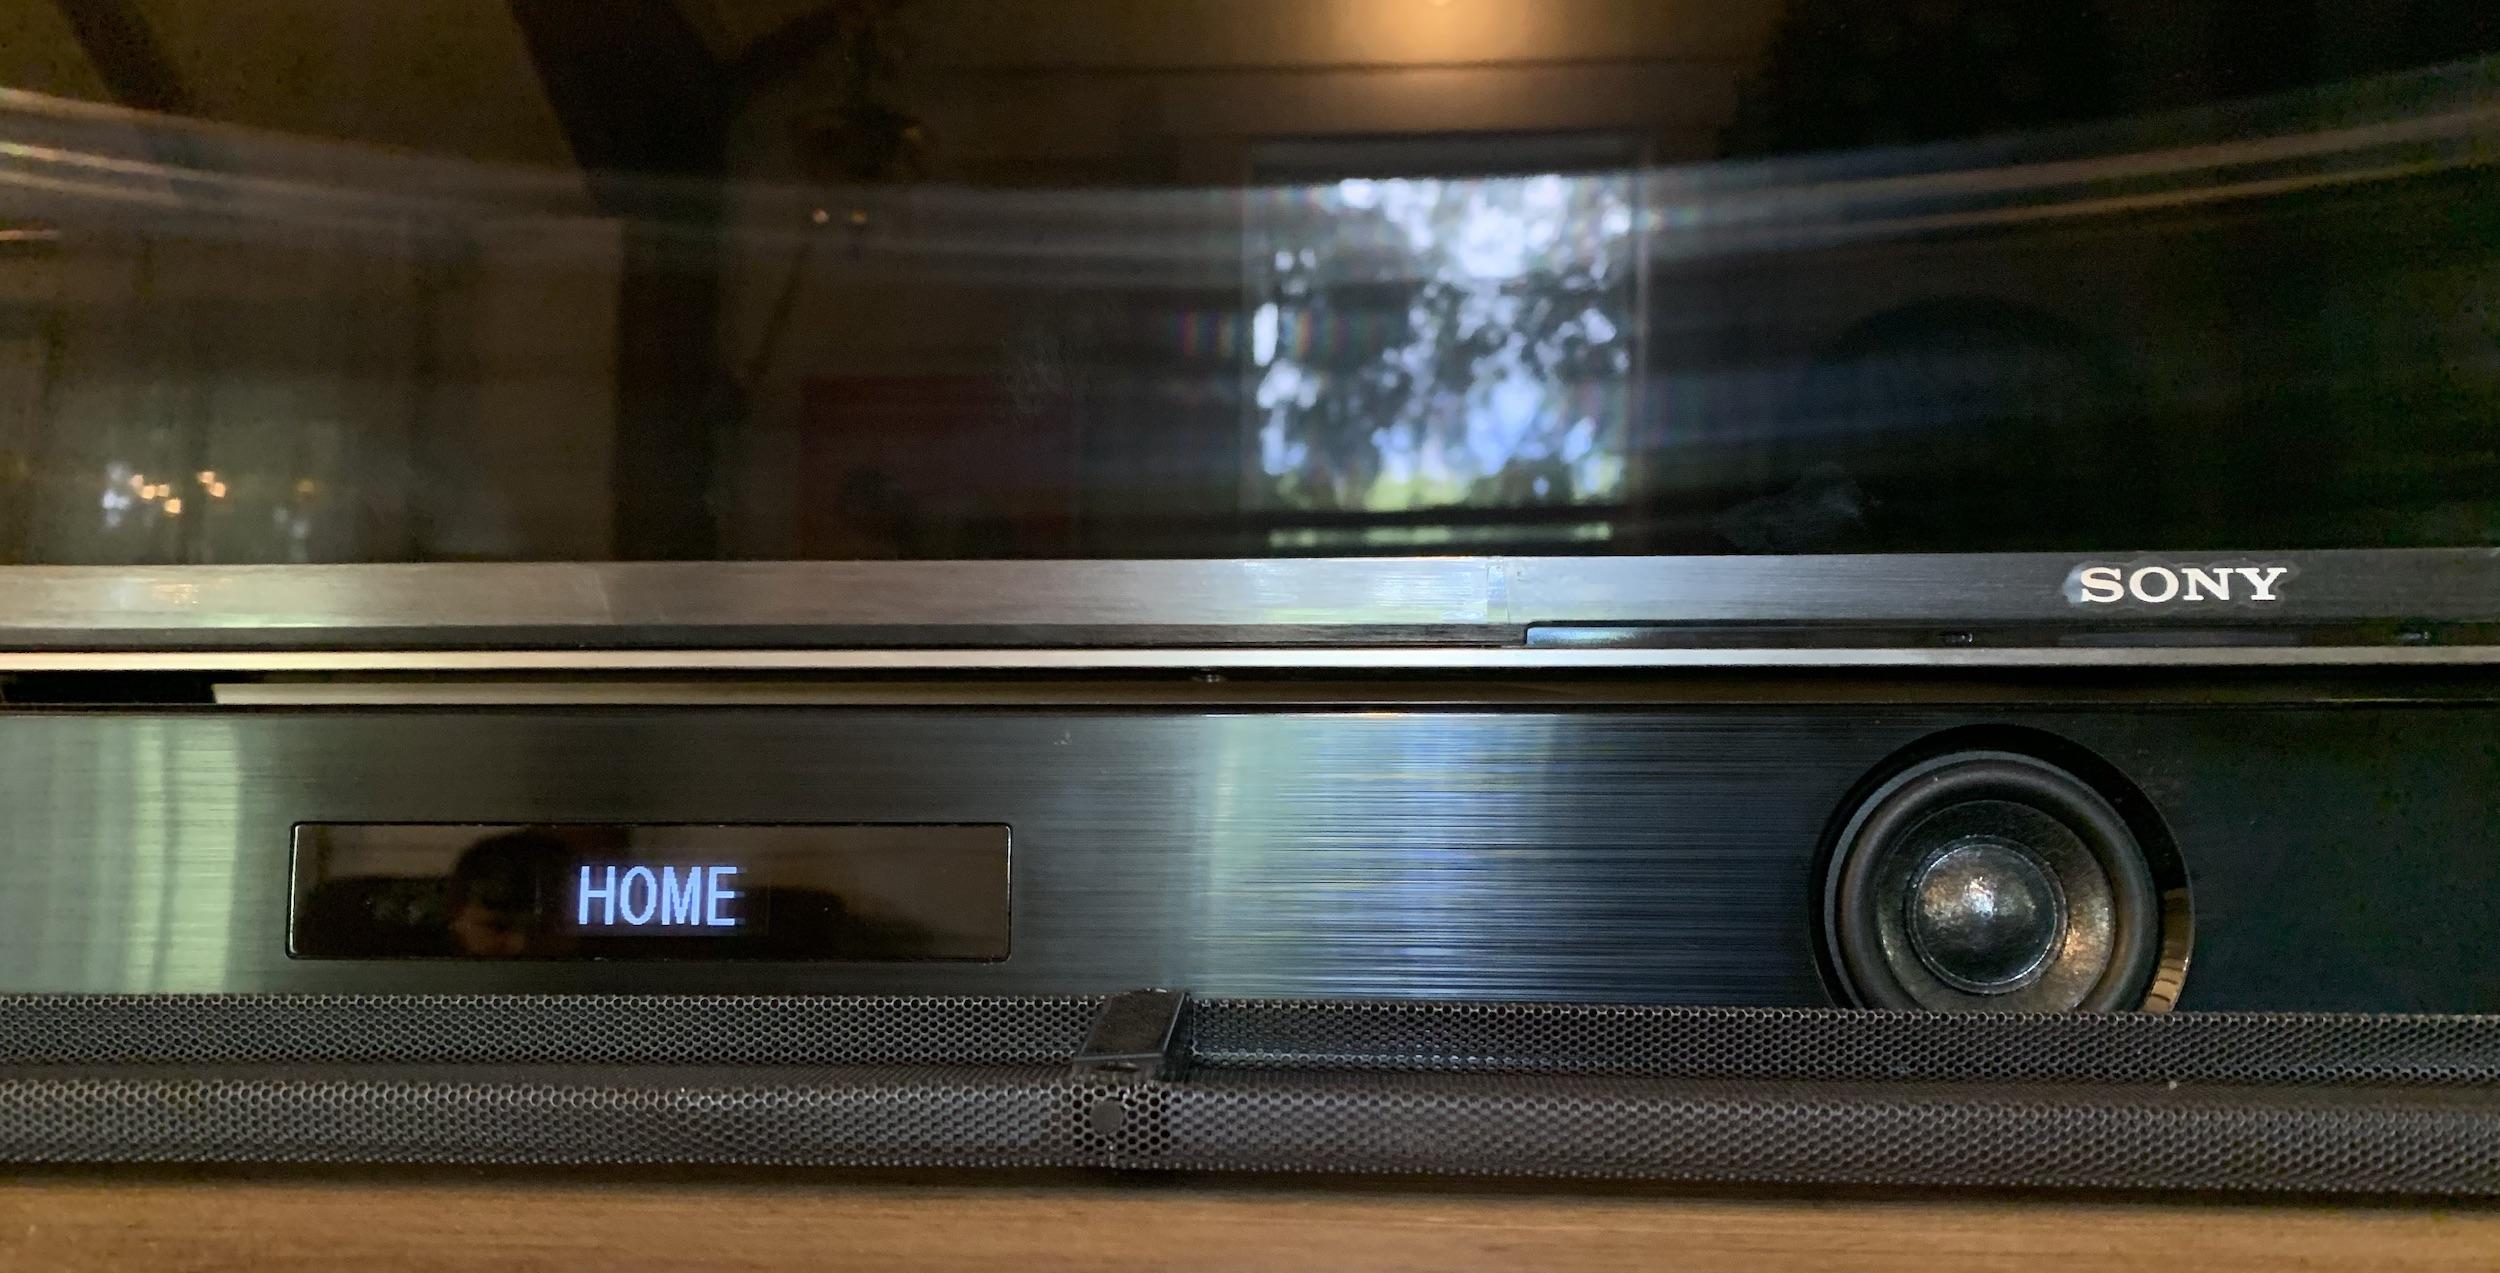 Sony X950G 4K HDR LED TV with Sony HTZ9F Soundbar